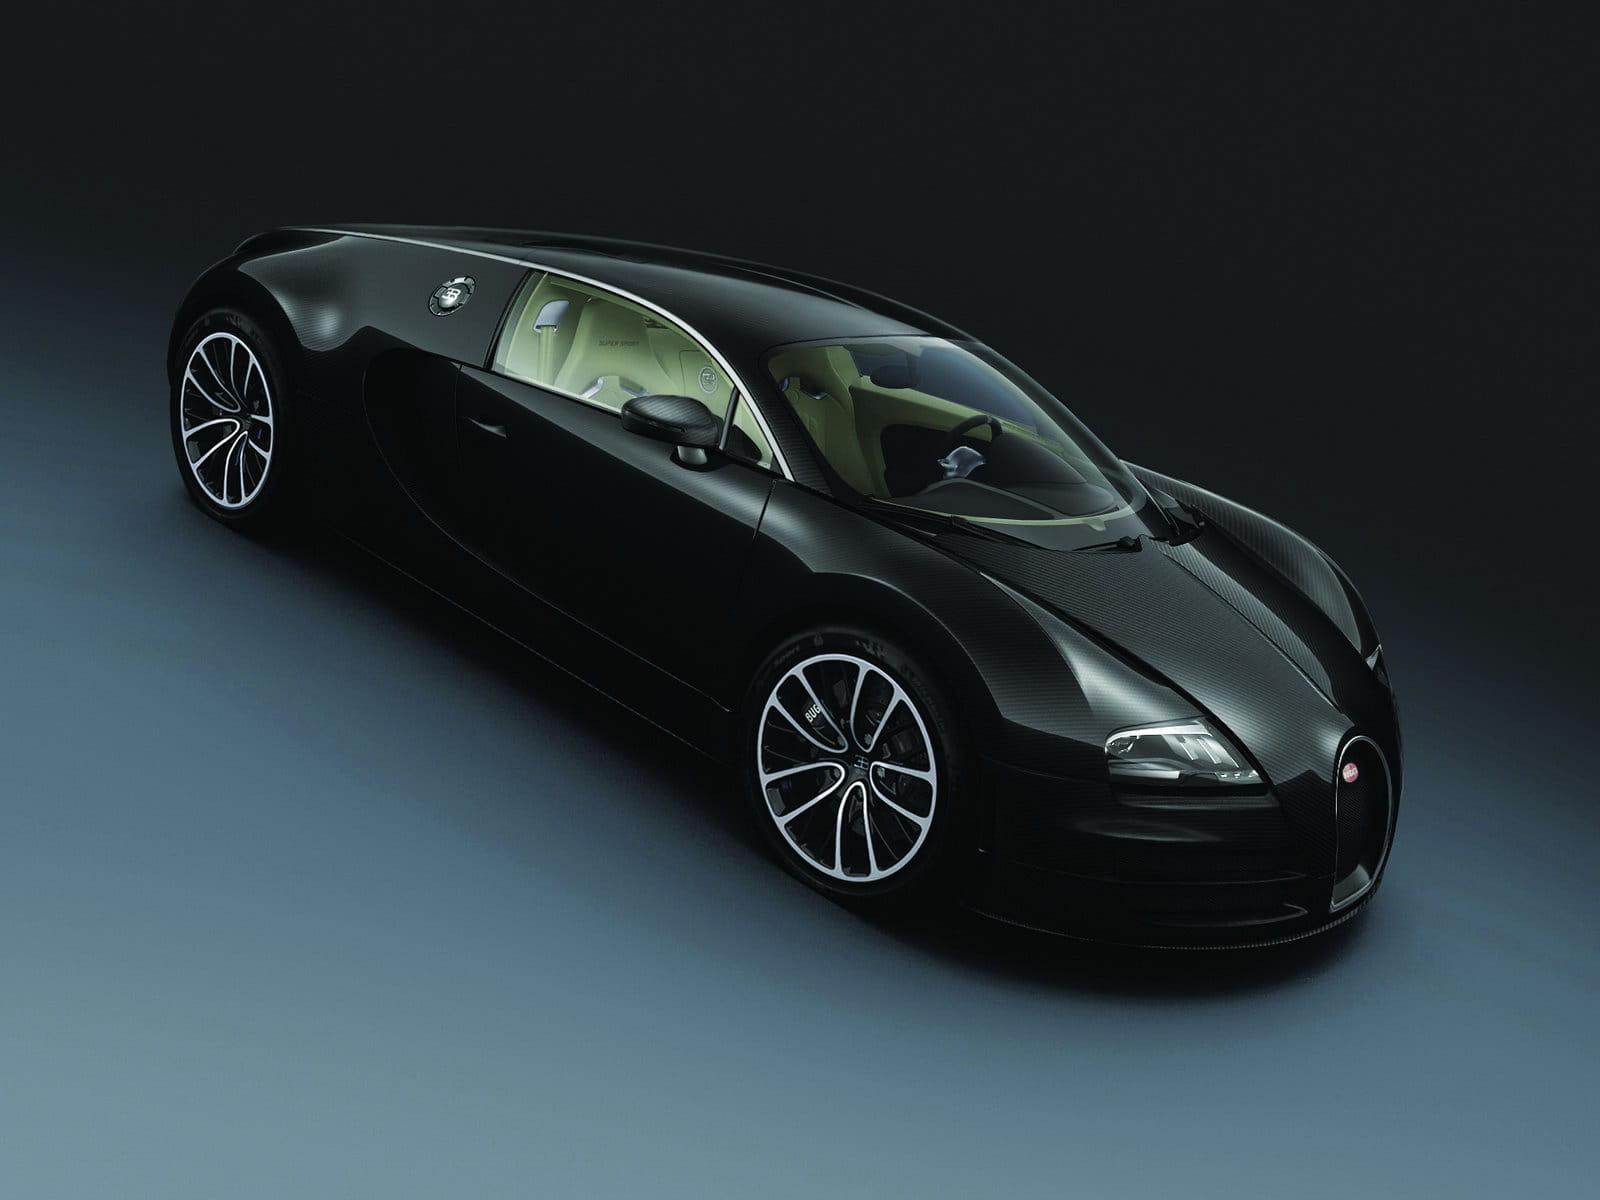 bugatti-veyron-super-sport-shanghai-1 Remarkable Bugatti Veyron Grand Sport Vitesse Informacion Cars Trend